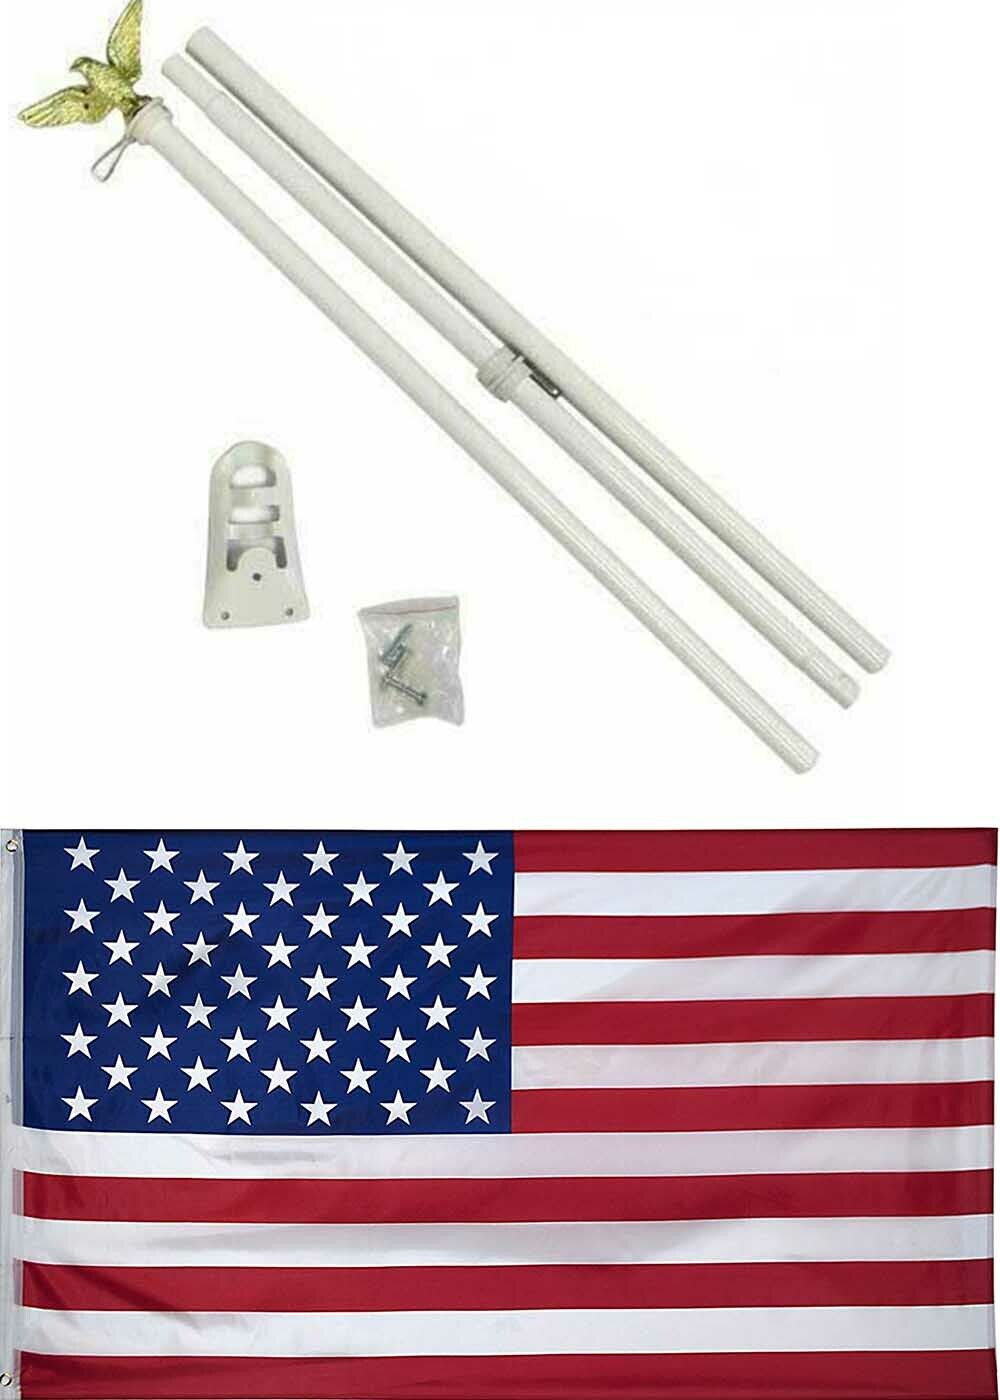 6' Ft Feet Steel Flagpole Flag Pole Kit White Eagle Bracket